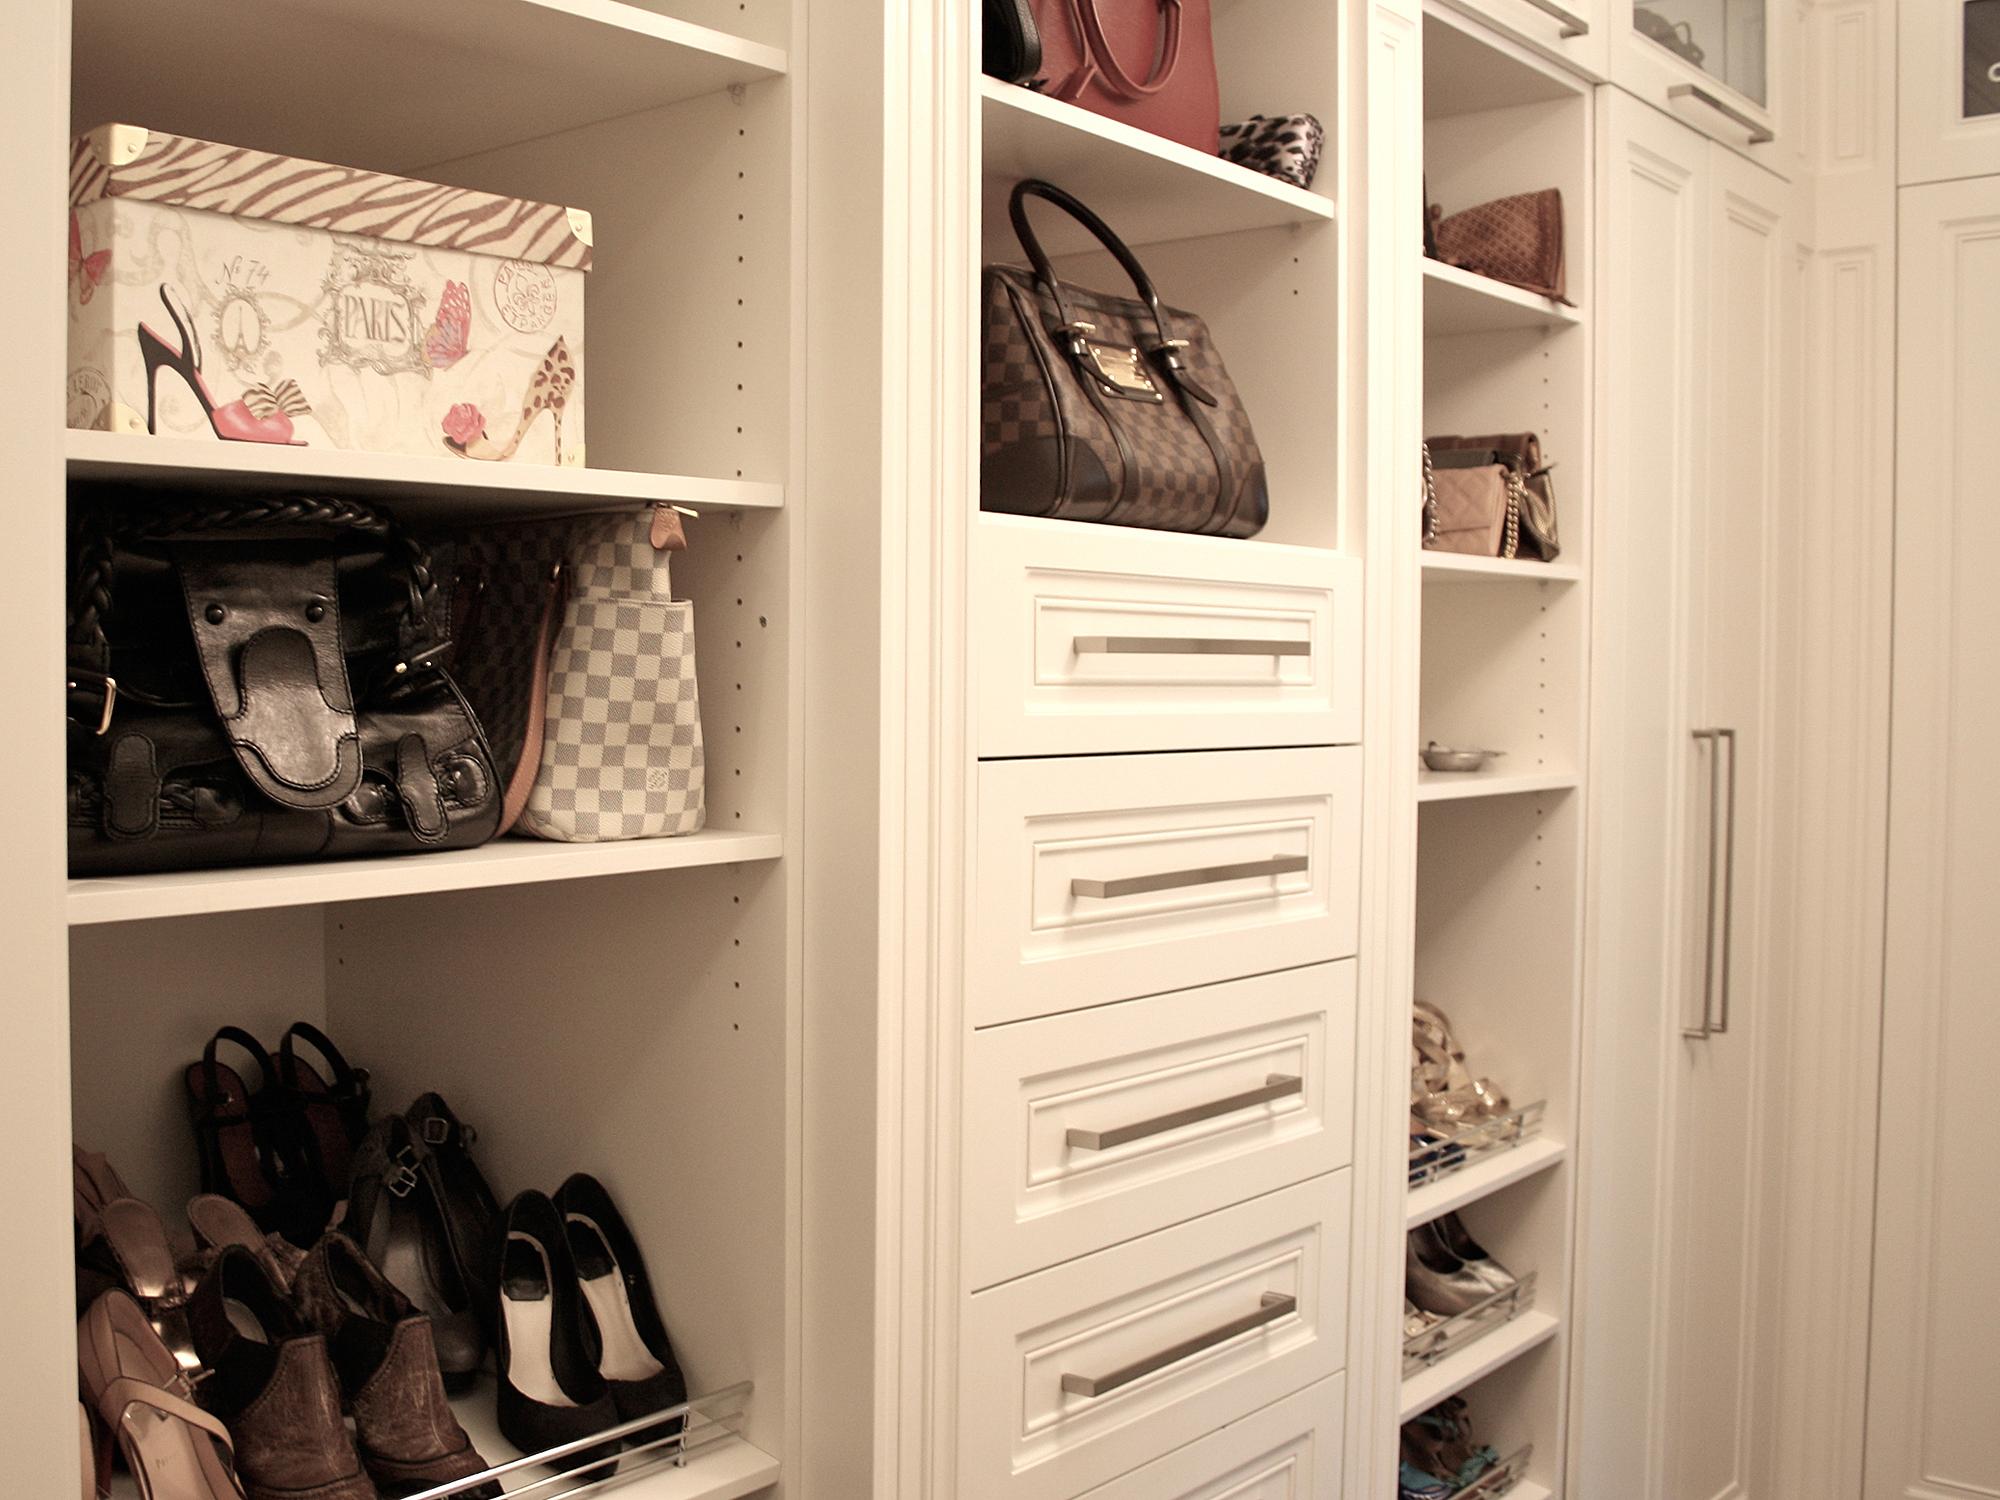 Landmark Closets Best Closets Company Mississauga Custom Closets Company Brampton High End Kitchen Company Oakville Custom Closet Organizers